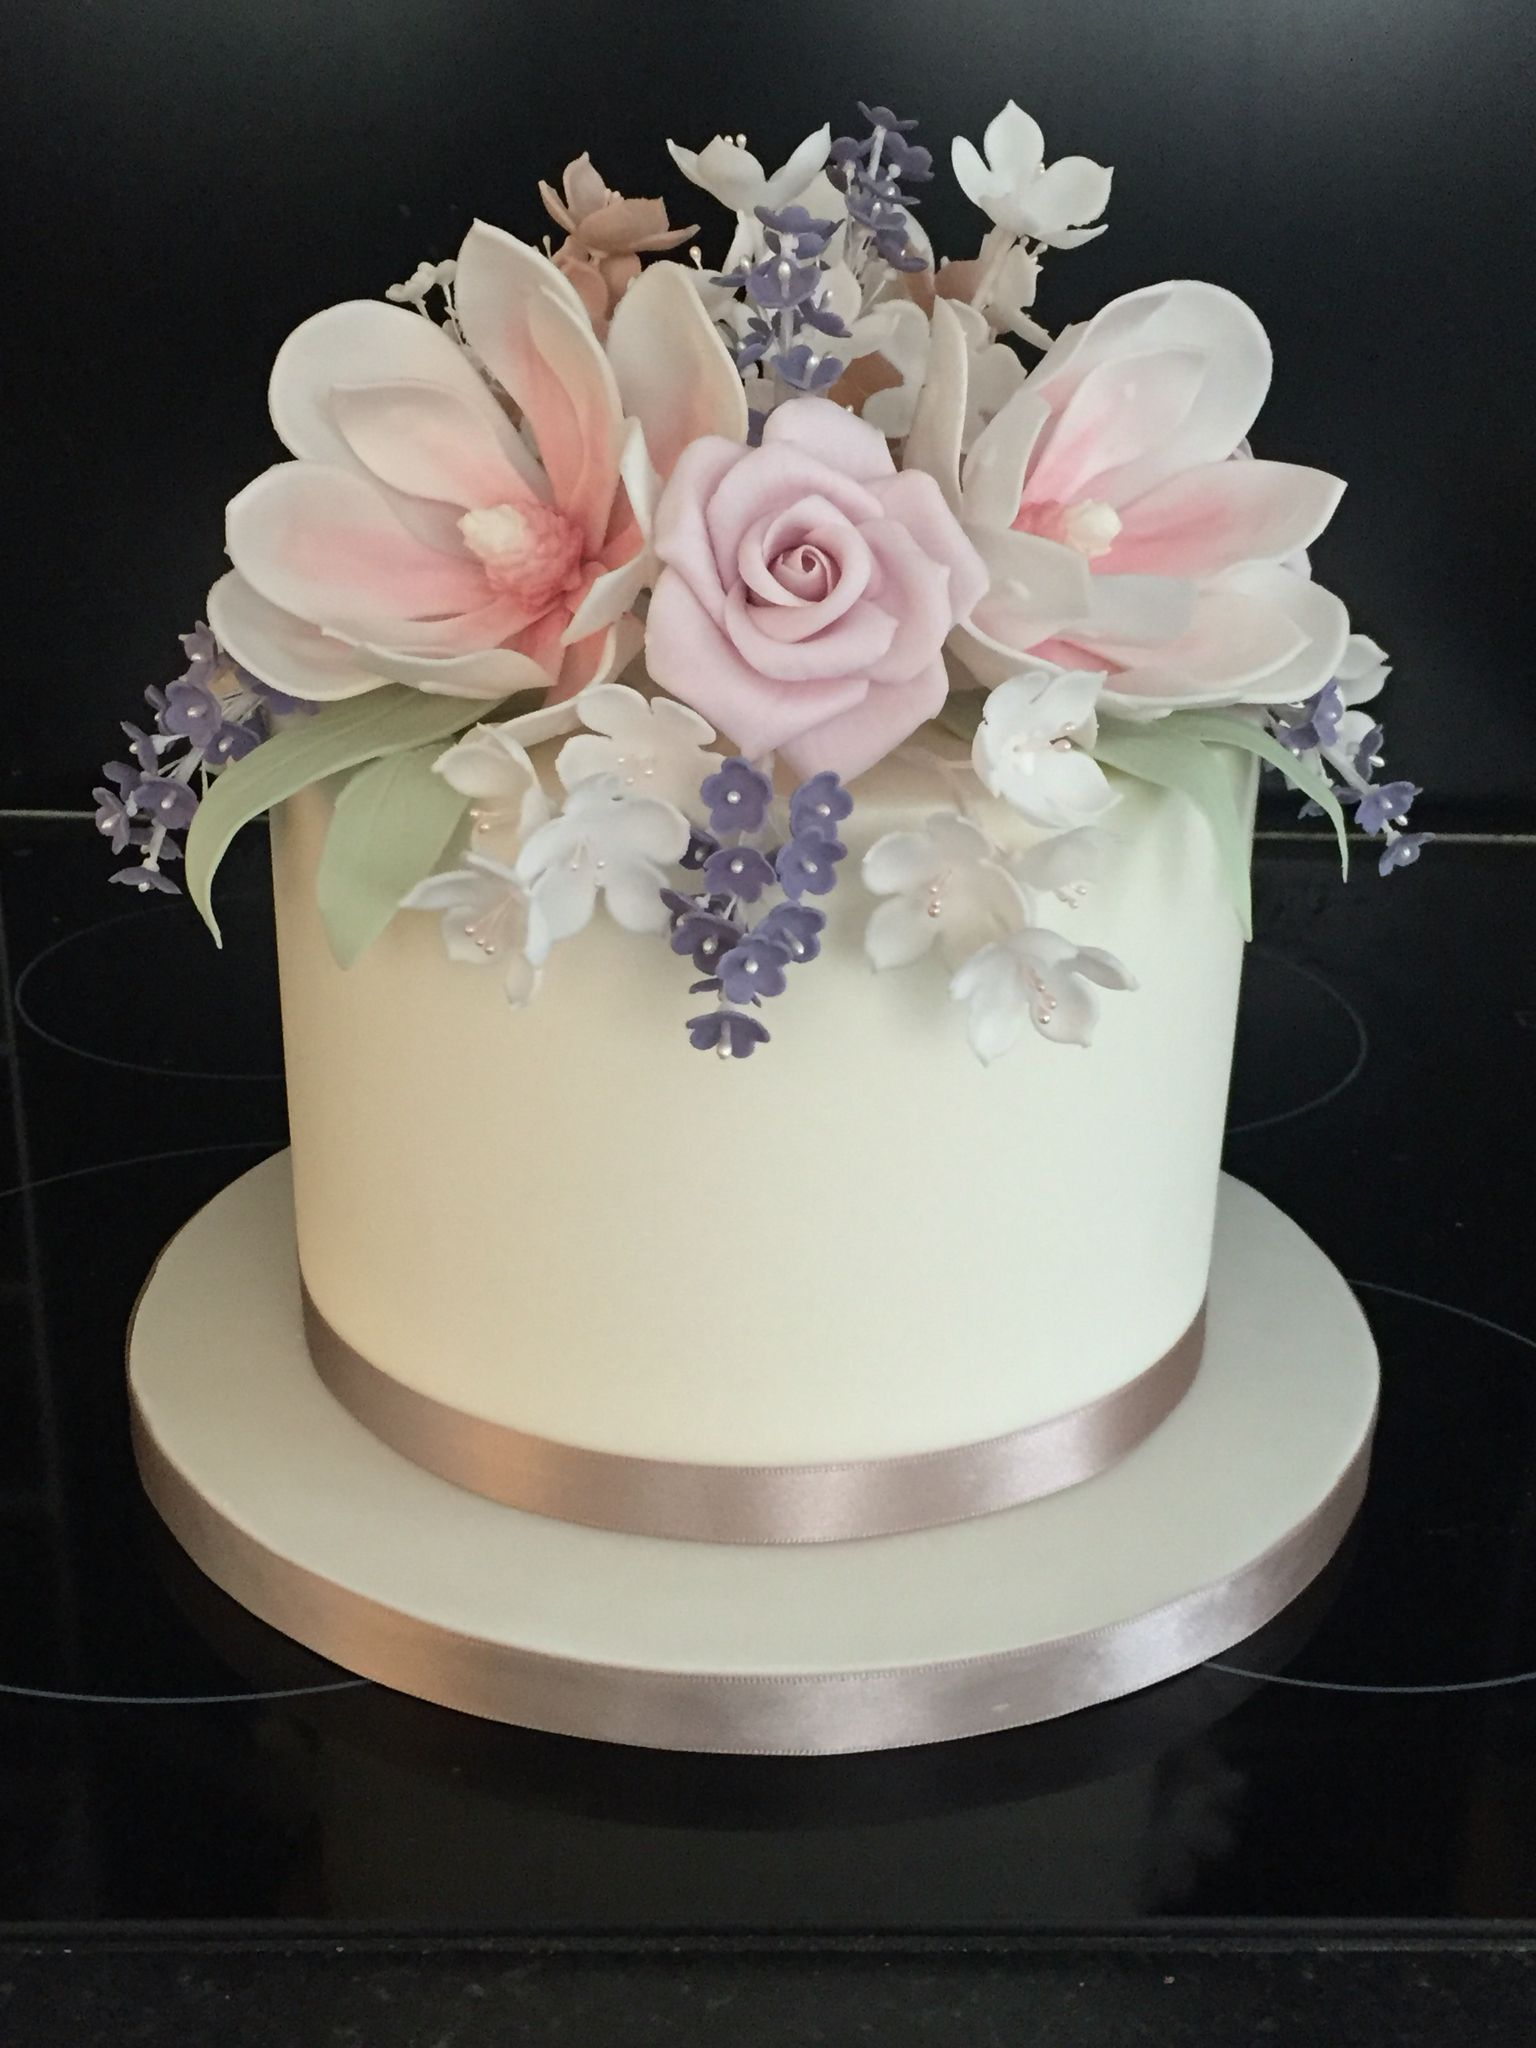 Single tier wedding cake with stunning flowers. Works